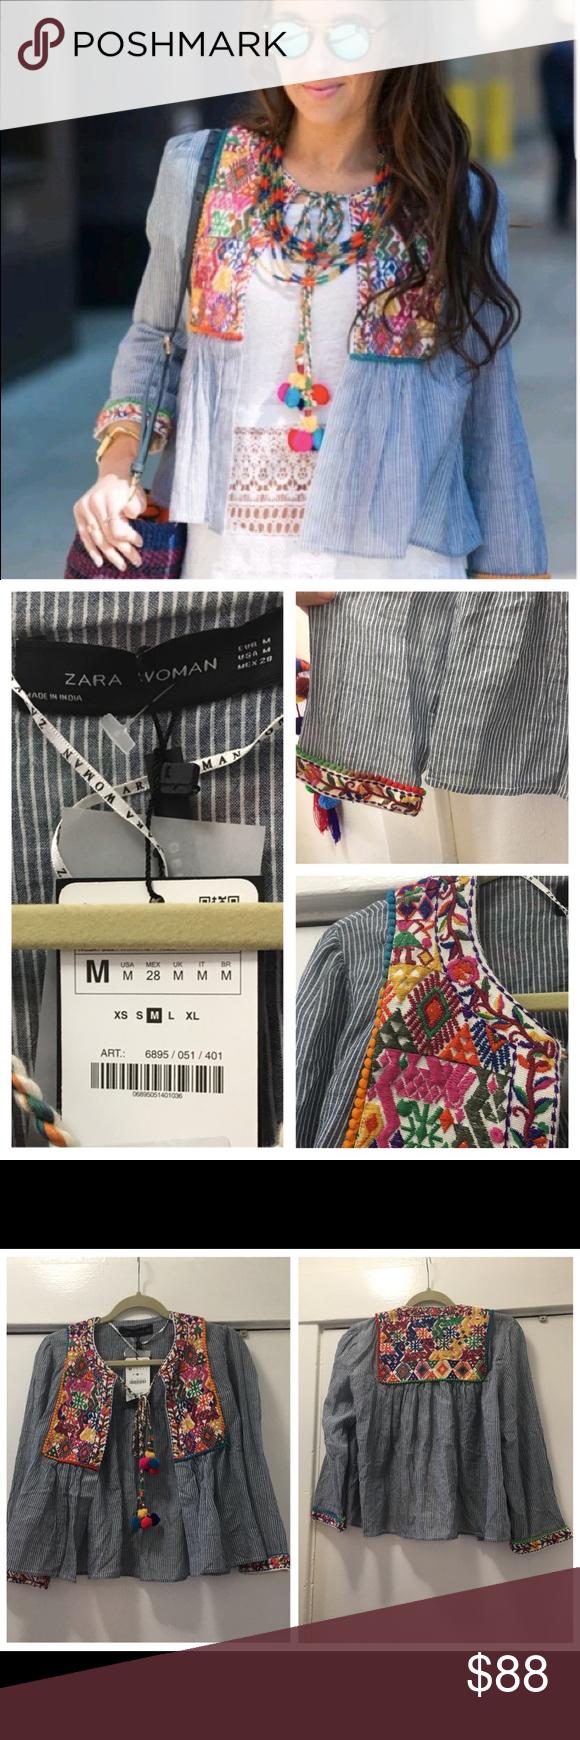 Zara Nwt Embroidered Pom Pom Jacket Size Medium Super Cute Summer